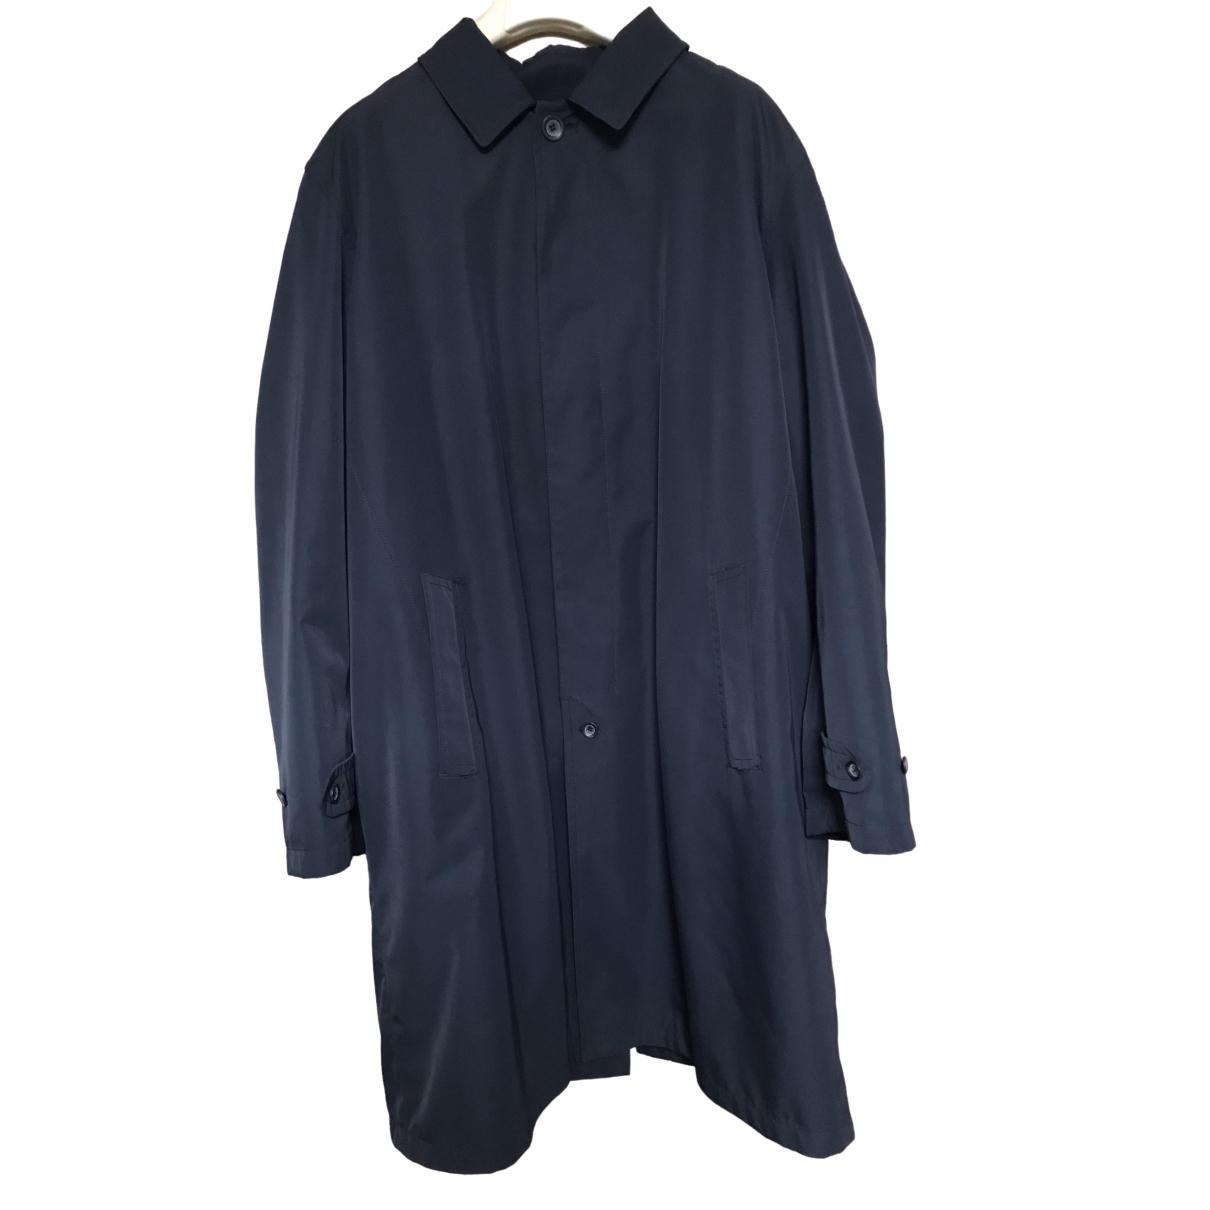 Allegri \N Jacke in  Blau Polyester